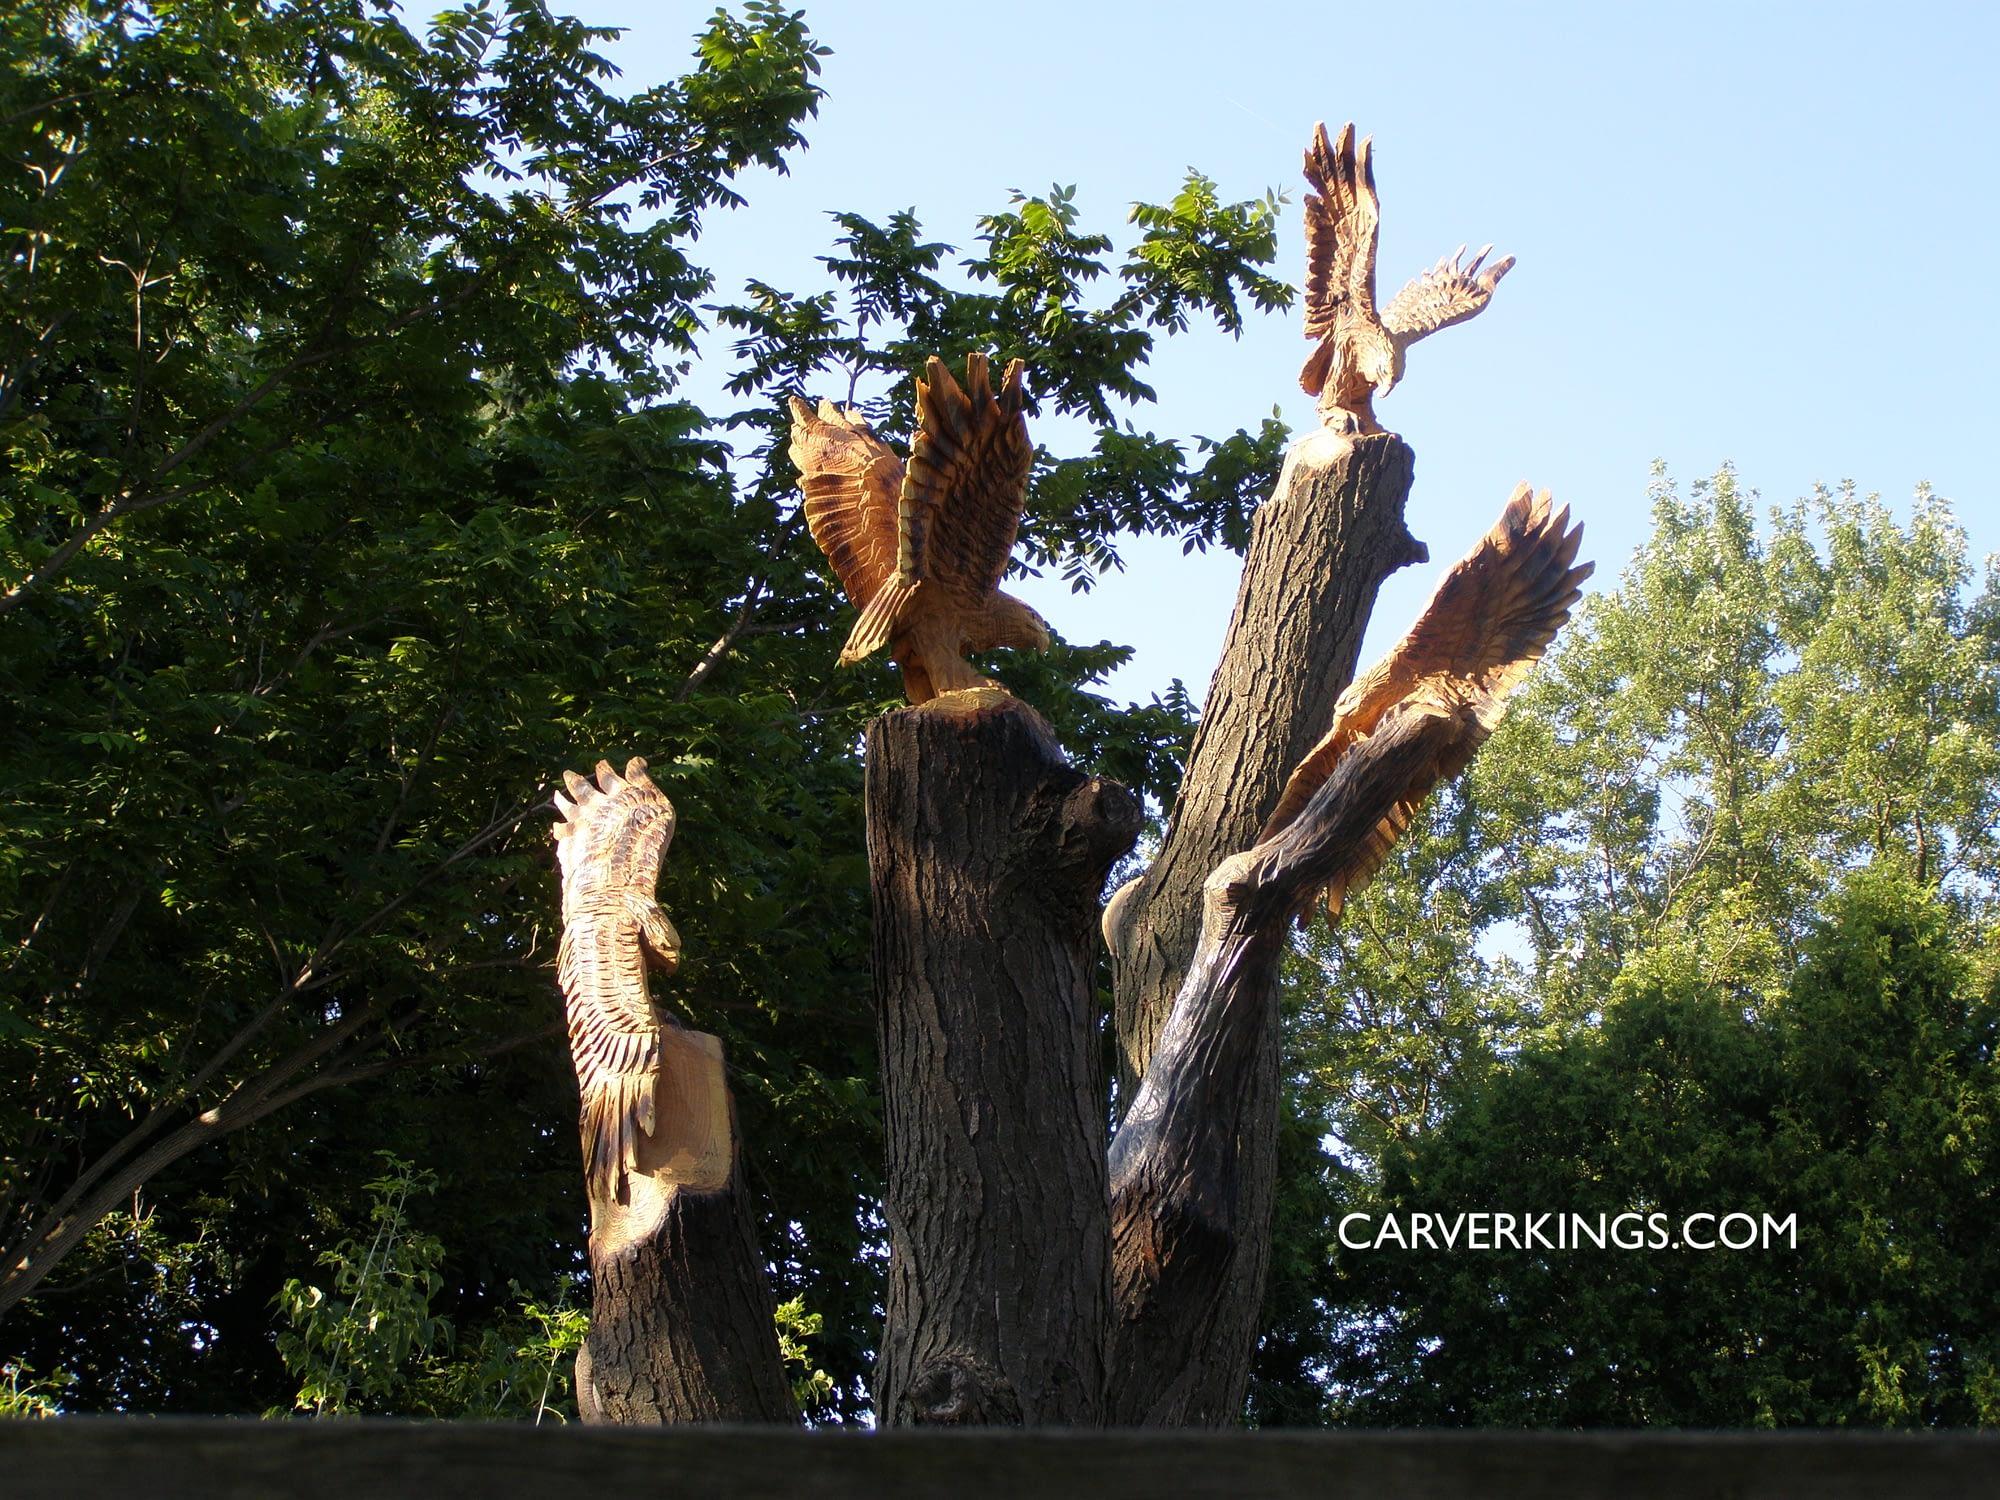 Carving, Soaring, Hawks